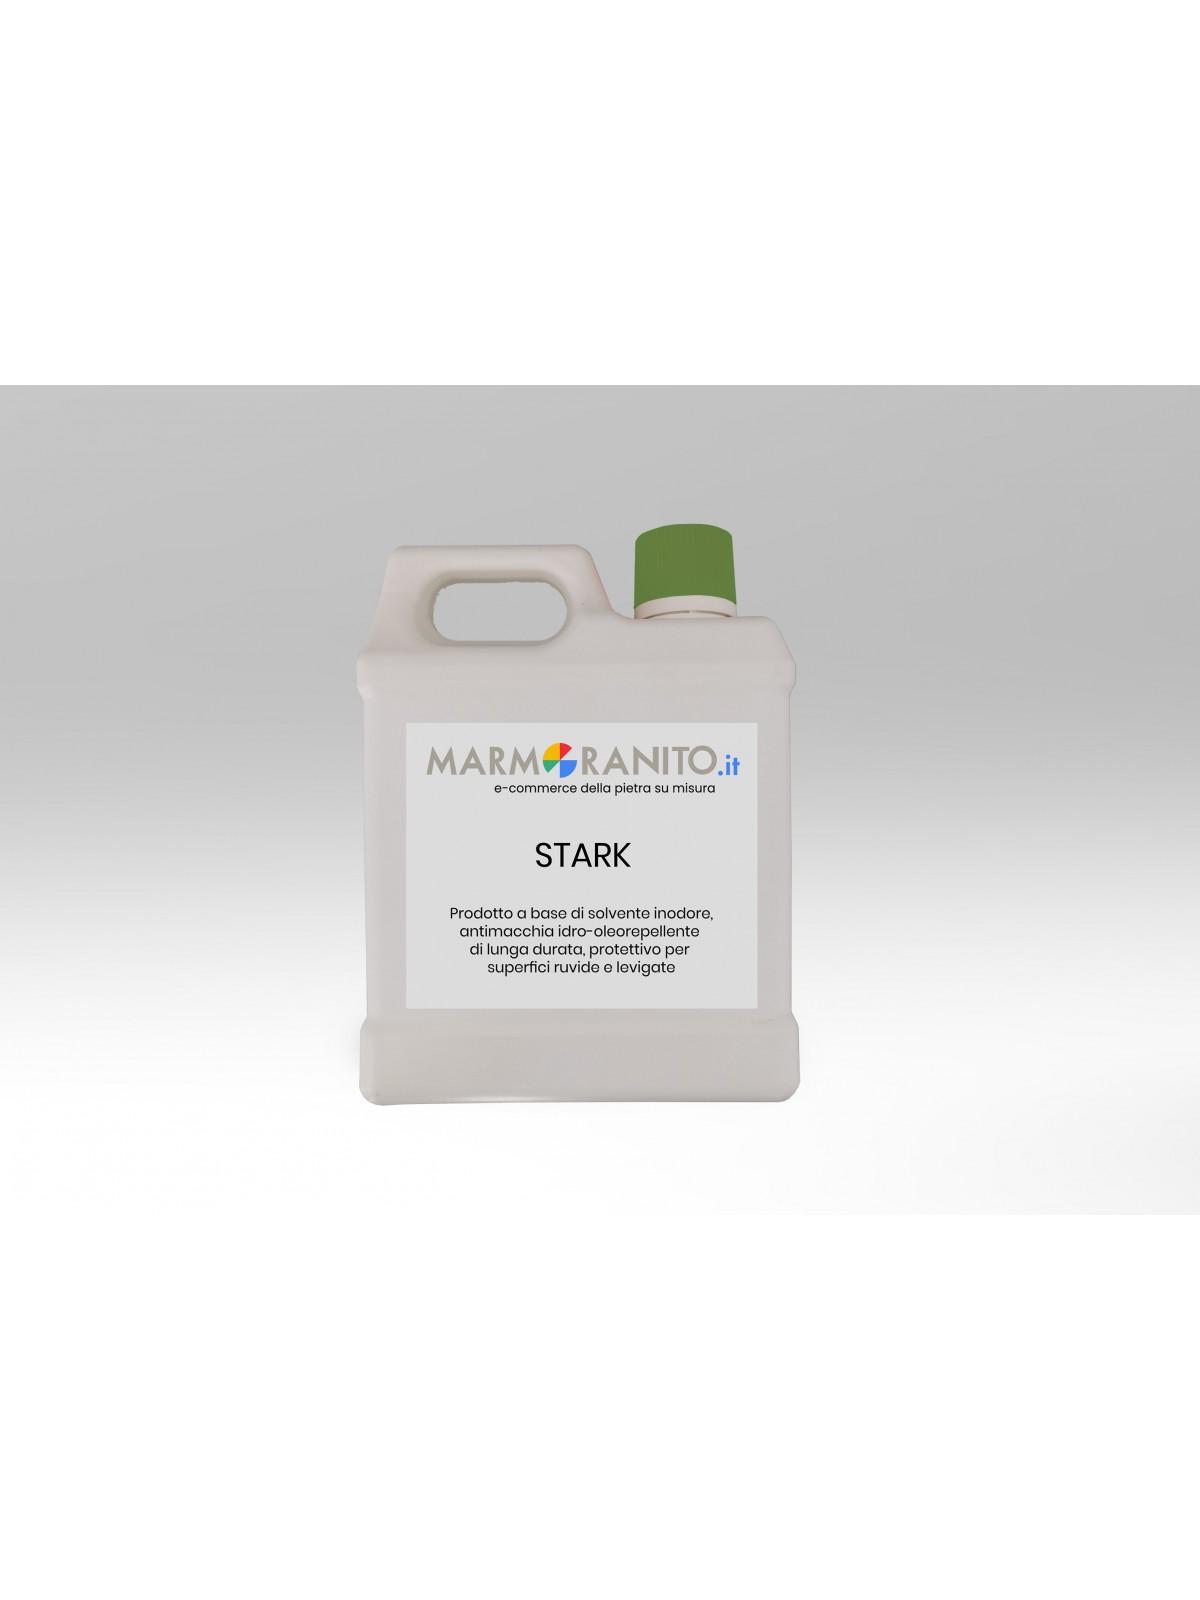 Stark 1 lt - Idro-Oleo Repellente Neutro